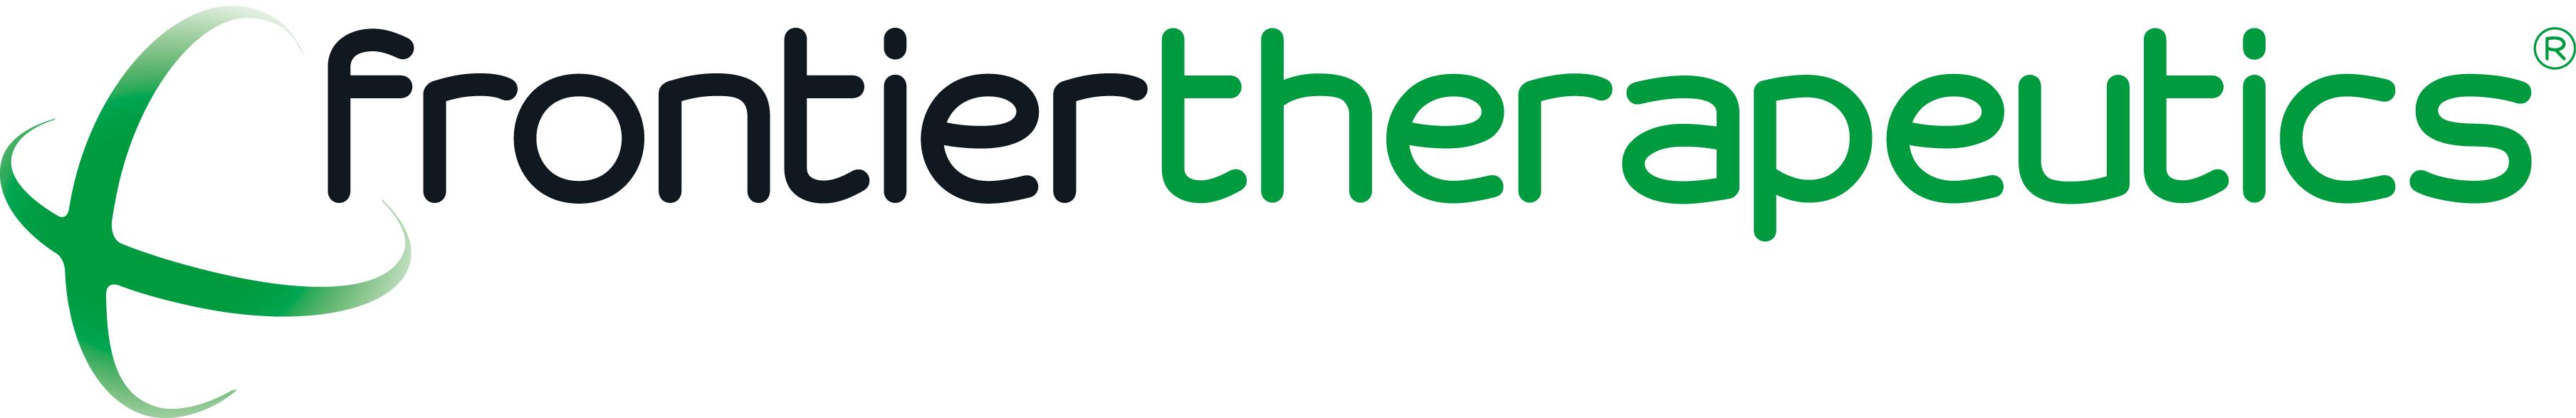 Frontier-Therapeutics-Inc-(Small)